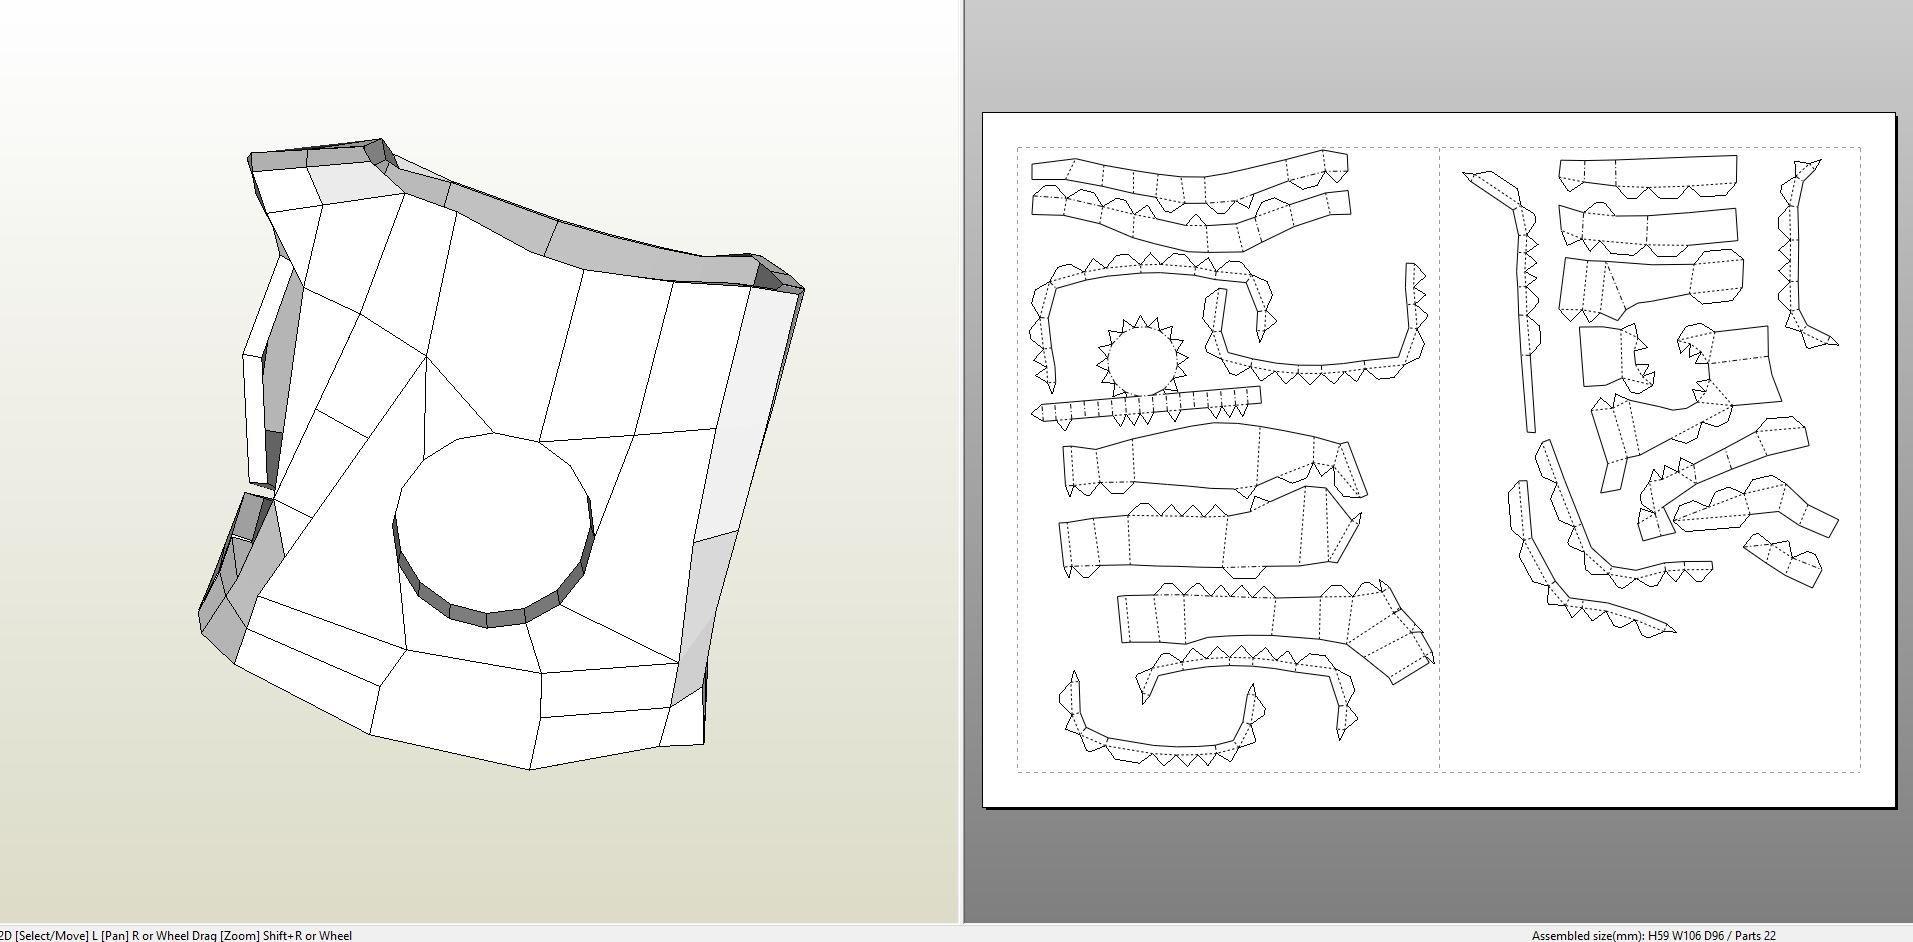 Ironman Papercraft Papercraft Pdo File Template for Iron Man Mk7 Full Armor